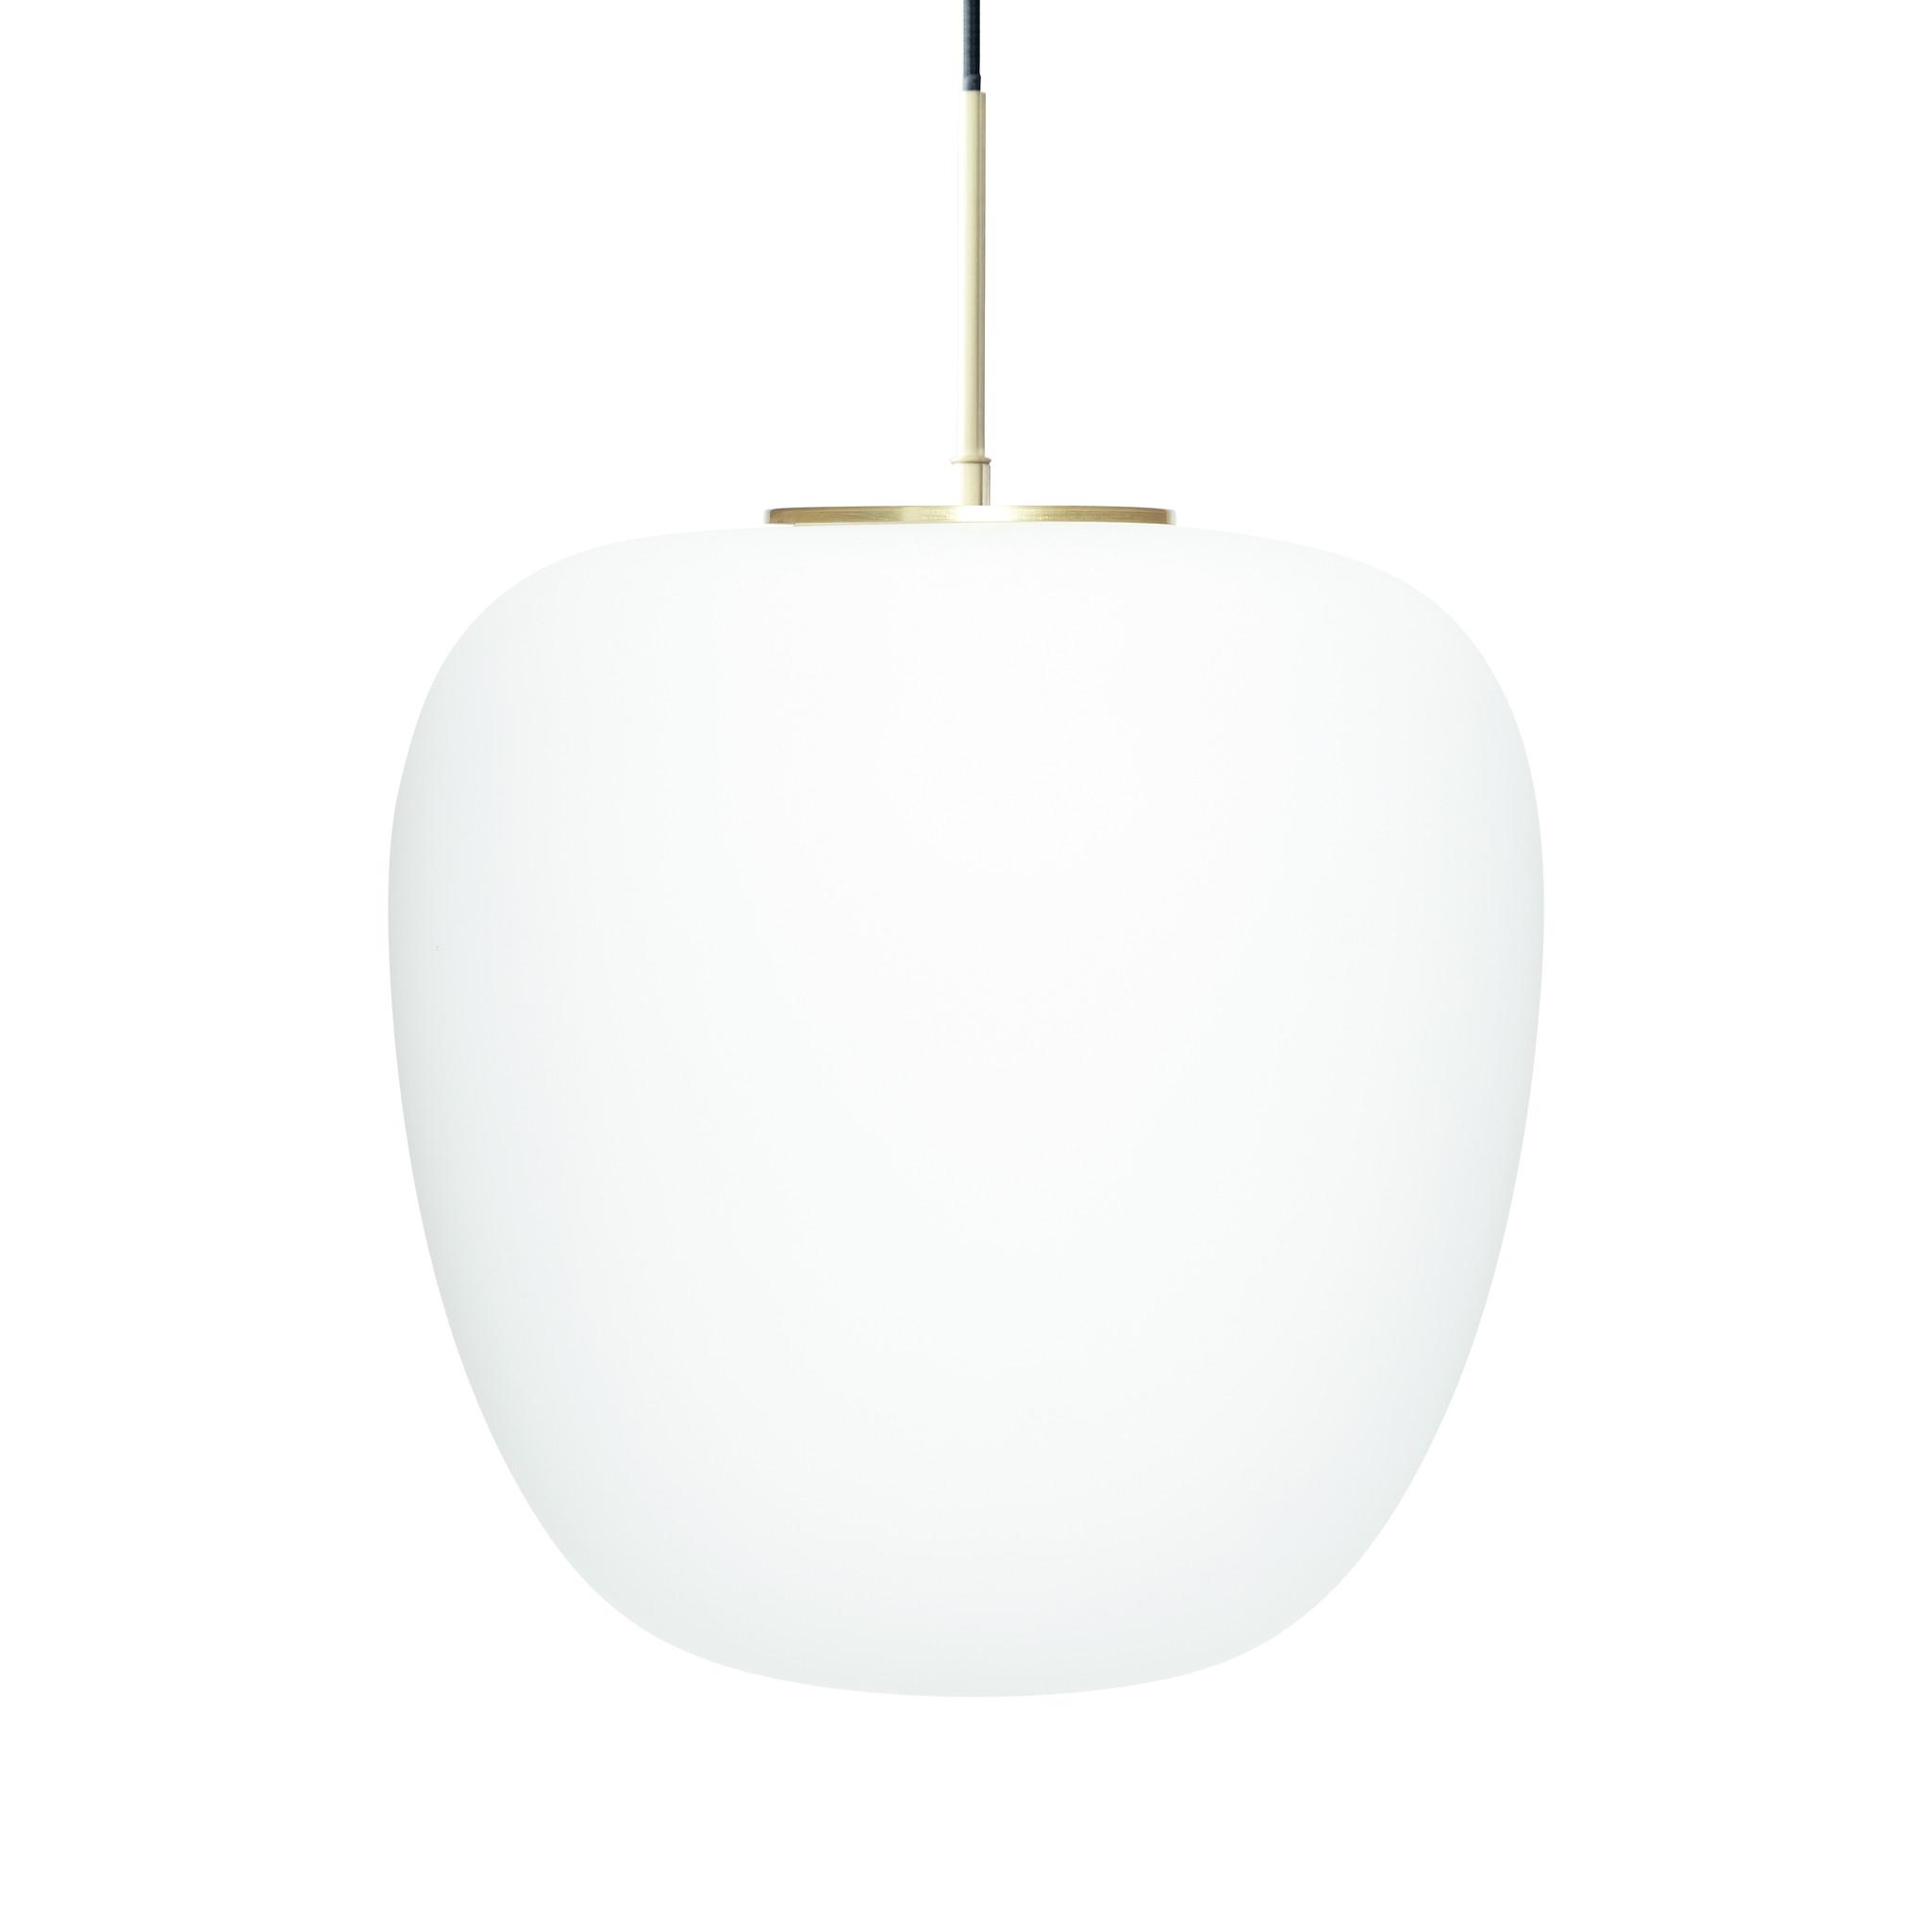 Hubsch Hanglamp glas wit/messing ø 40 cm